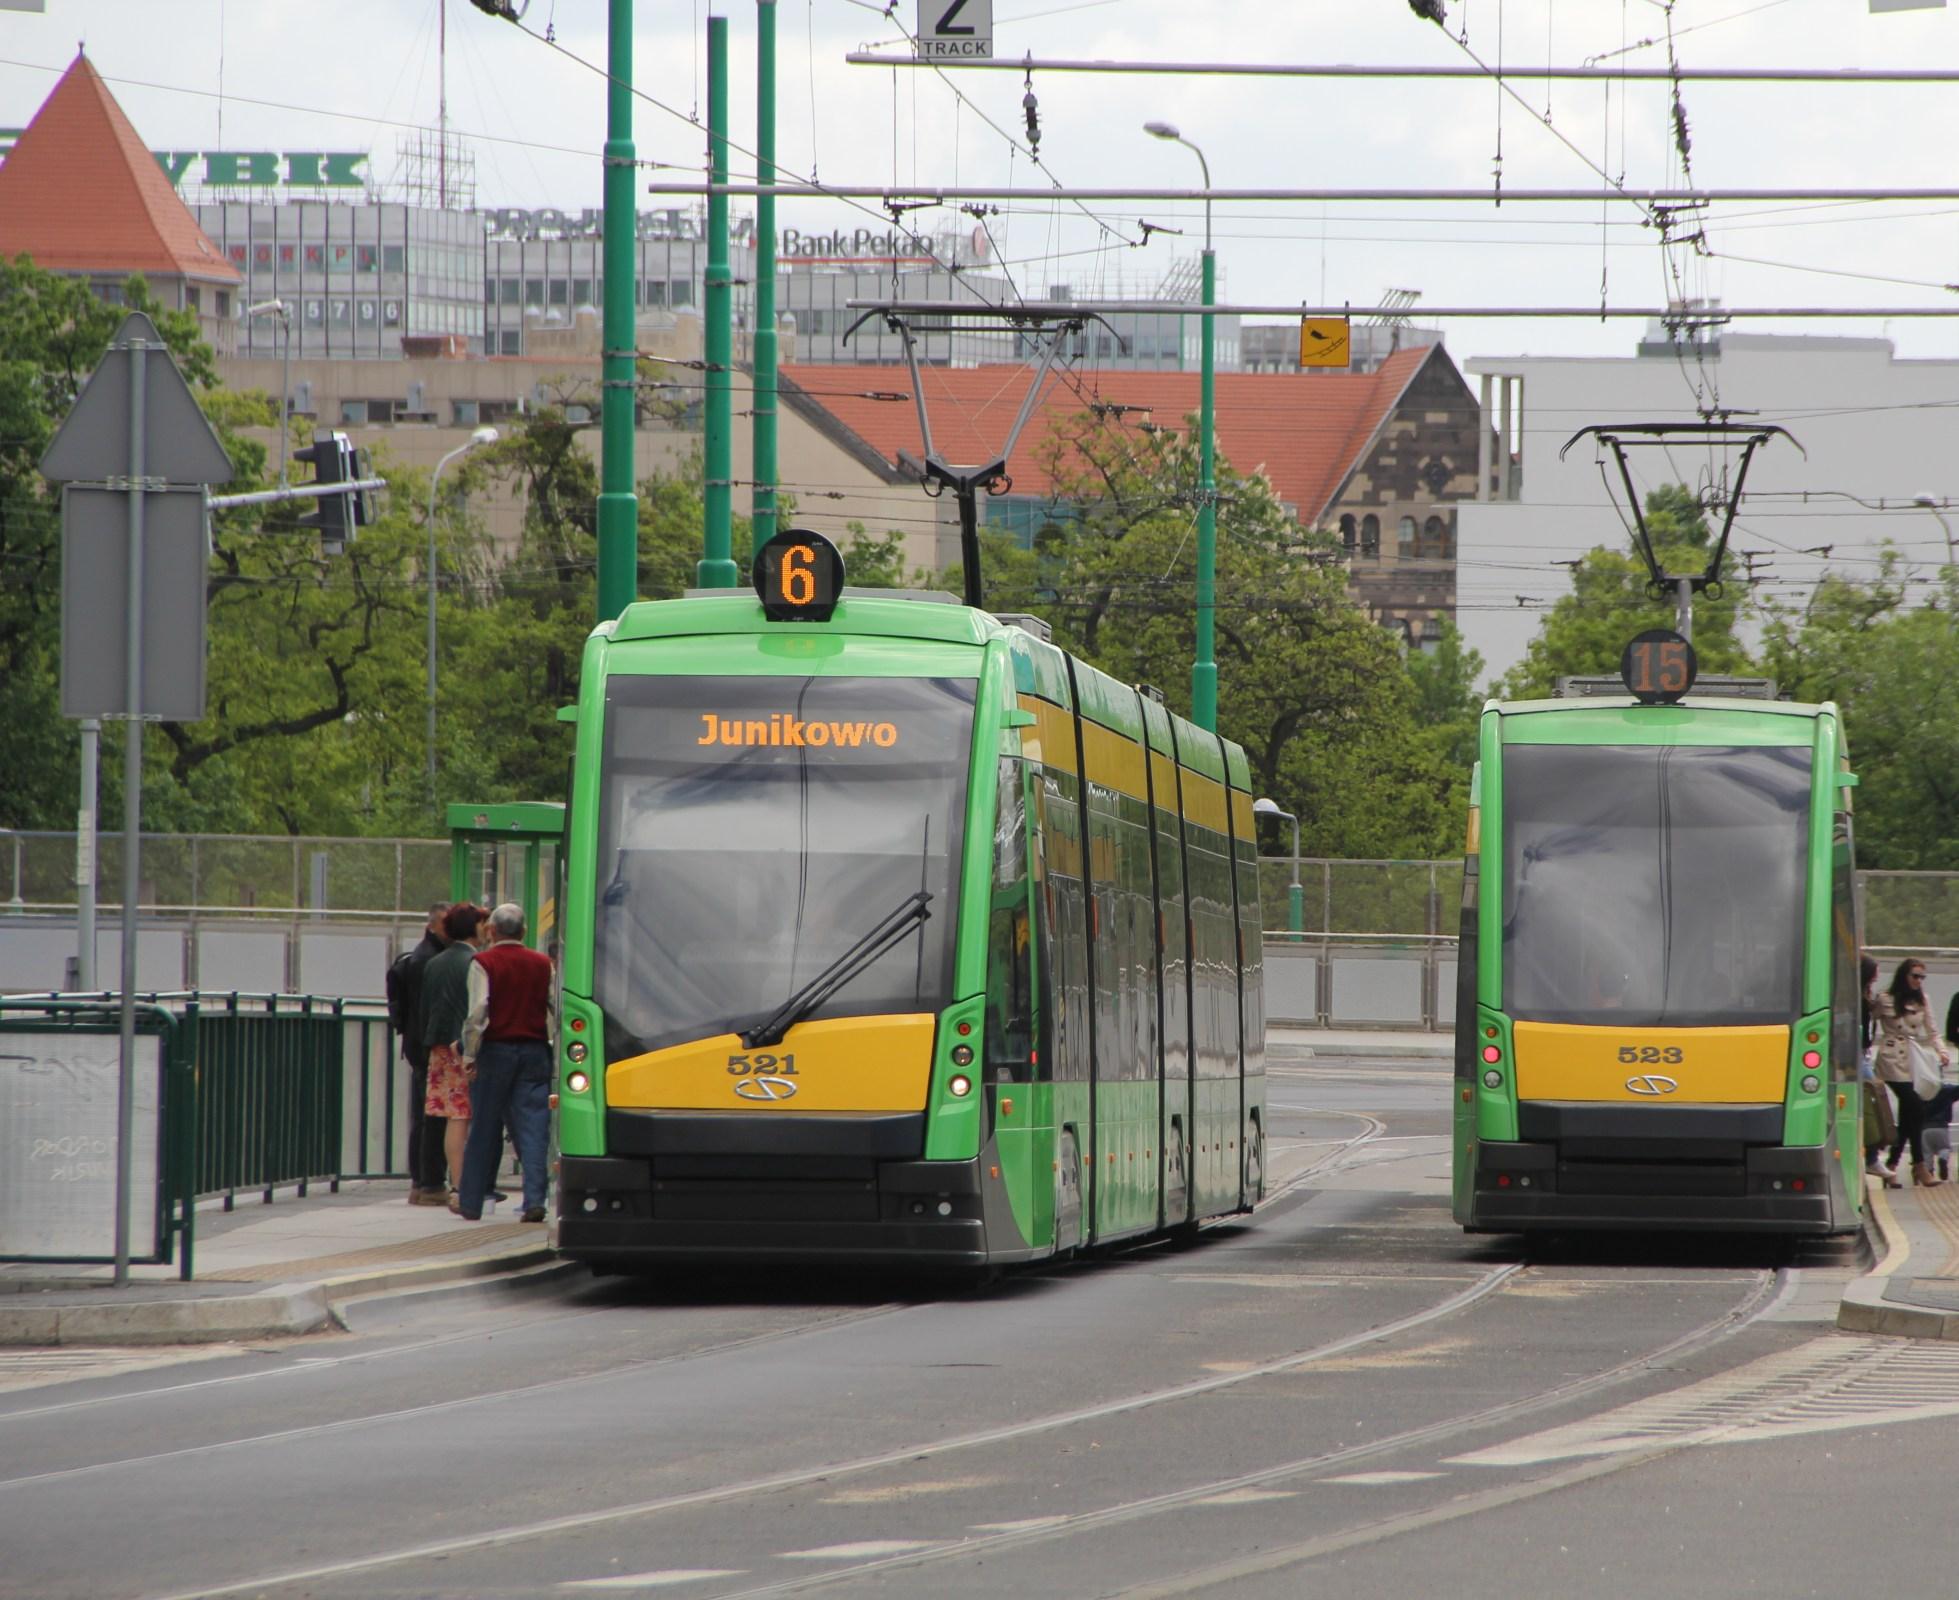 Tram Poznan